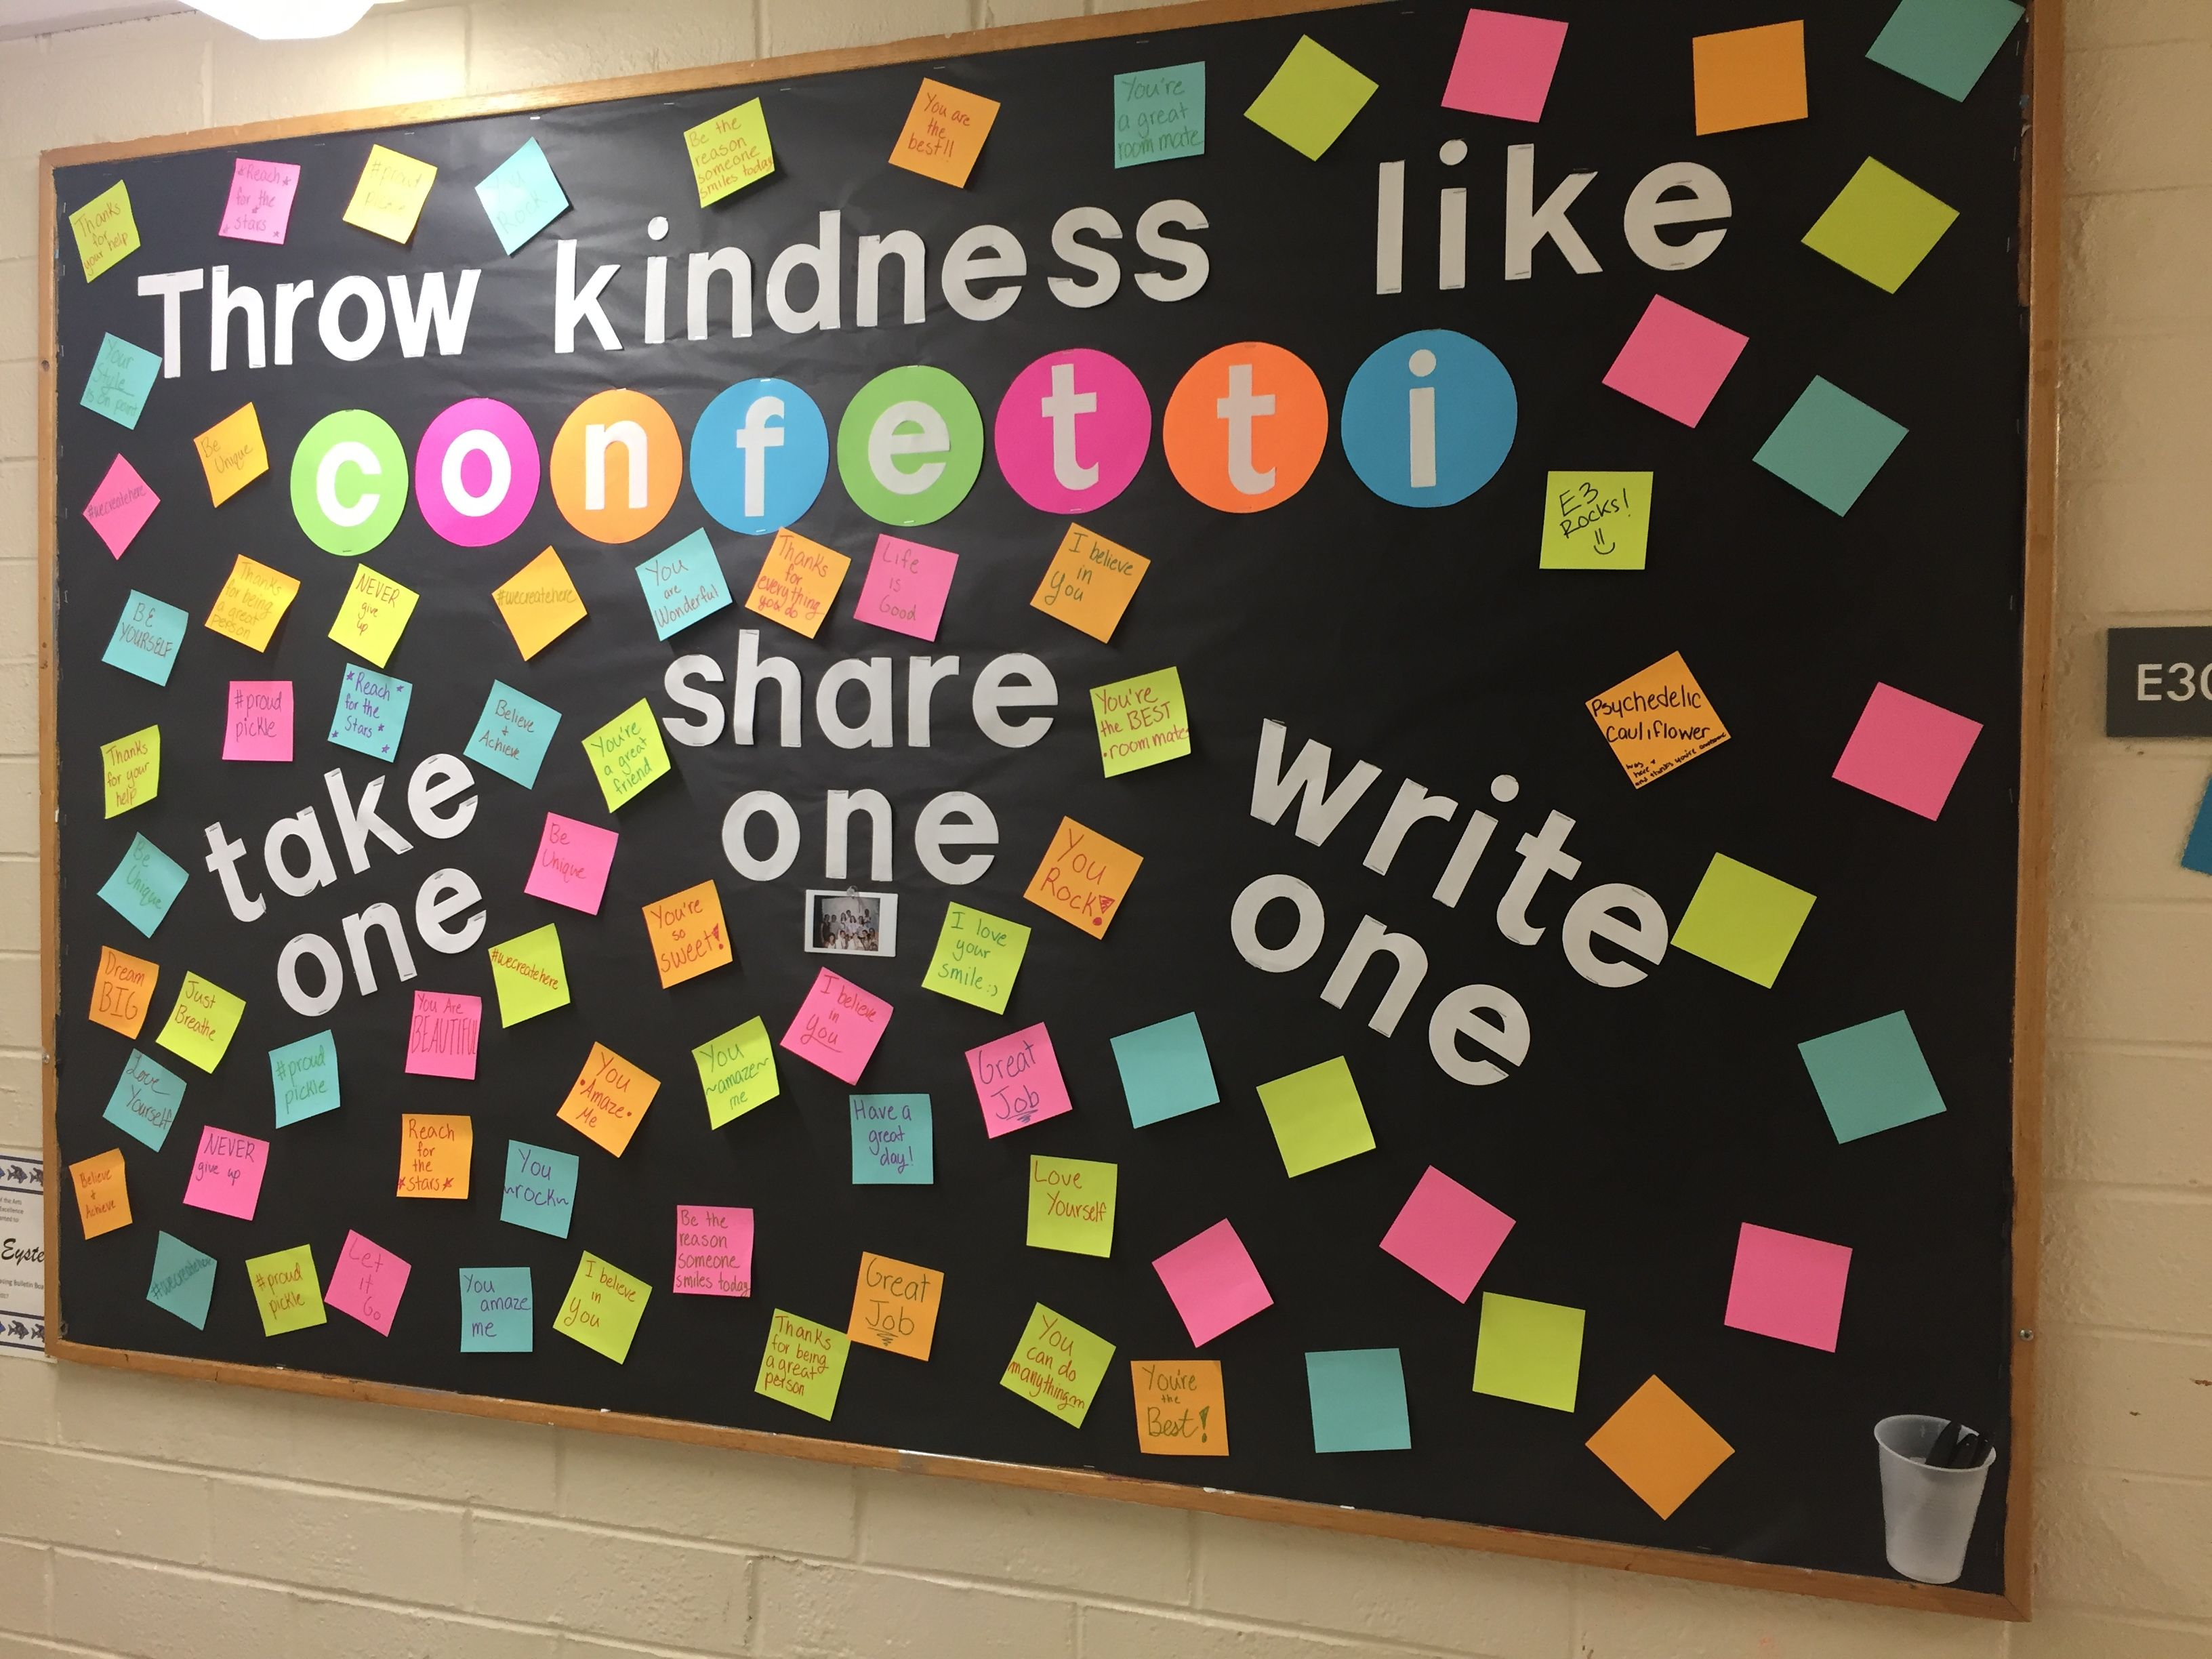 Interactive Ra Bulletin Board Throw Kindness Confetti